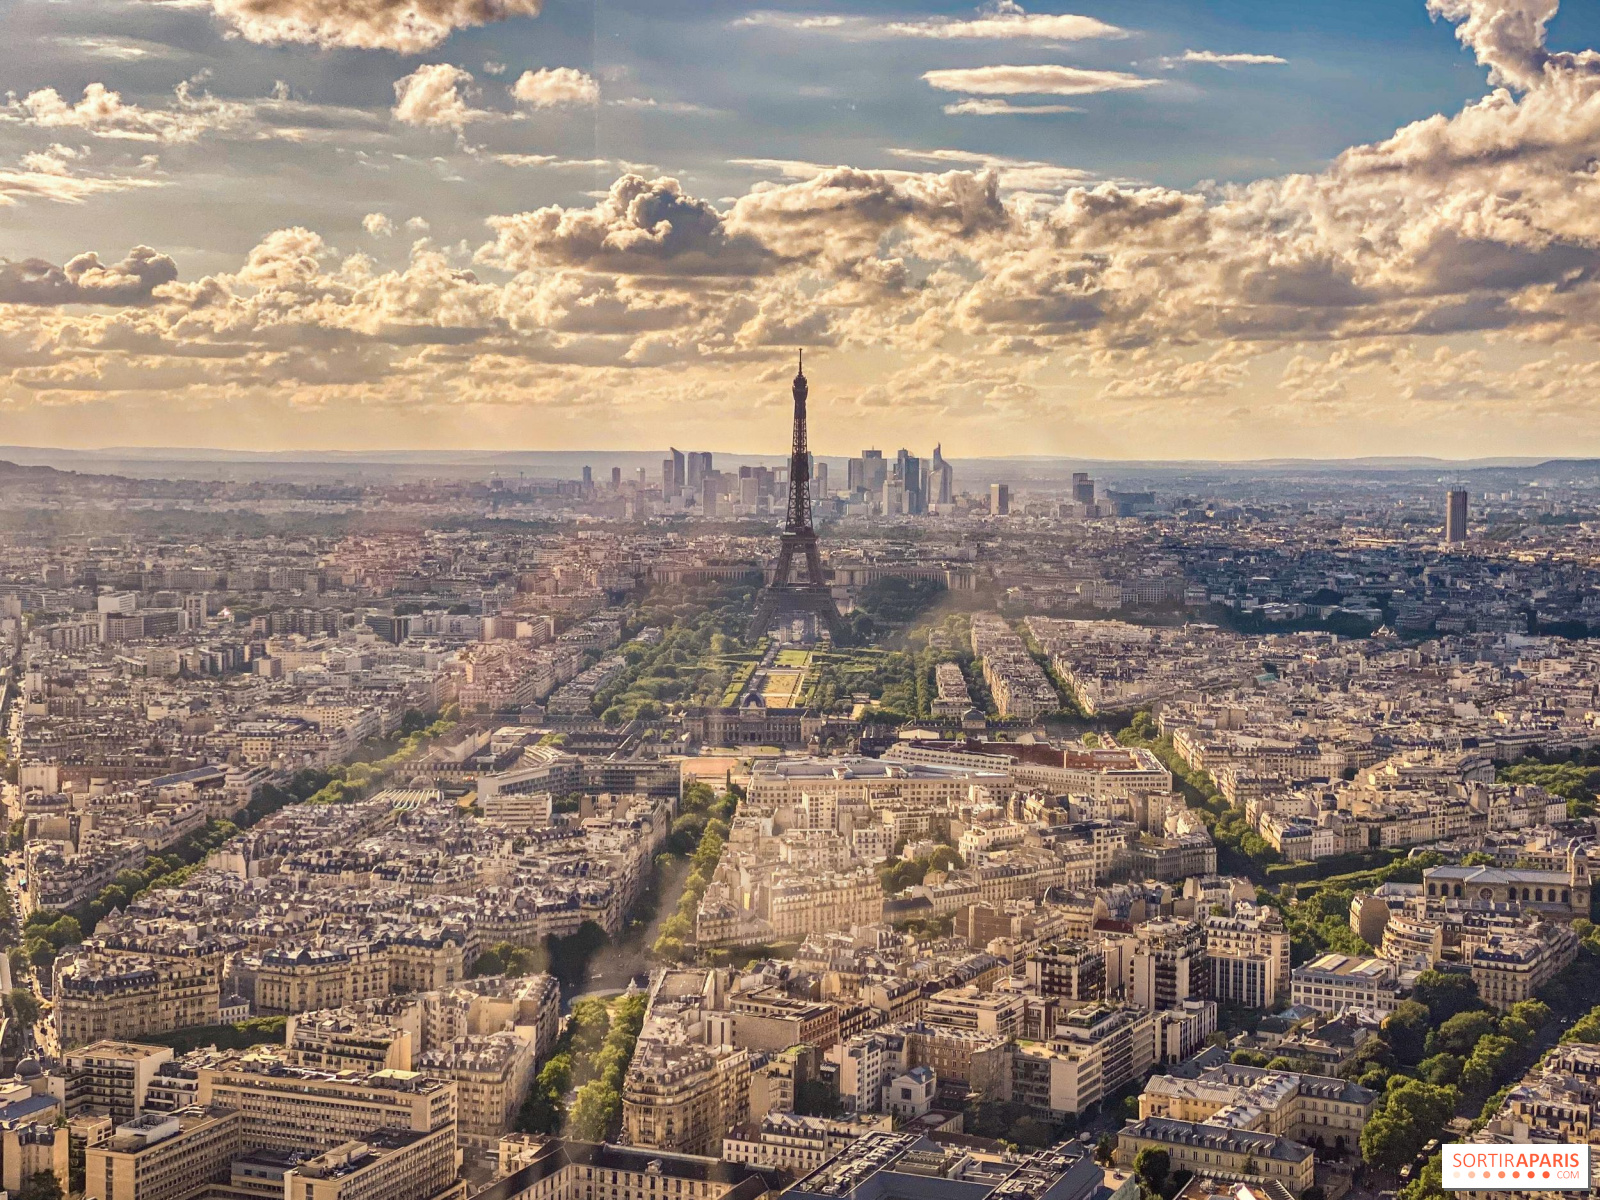 Coronavirus 69 Departements Classes En Zone D Alerte En France Dont 14 En Alerte Renforcee Sortiraparis Com